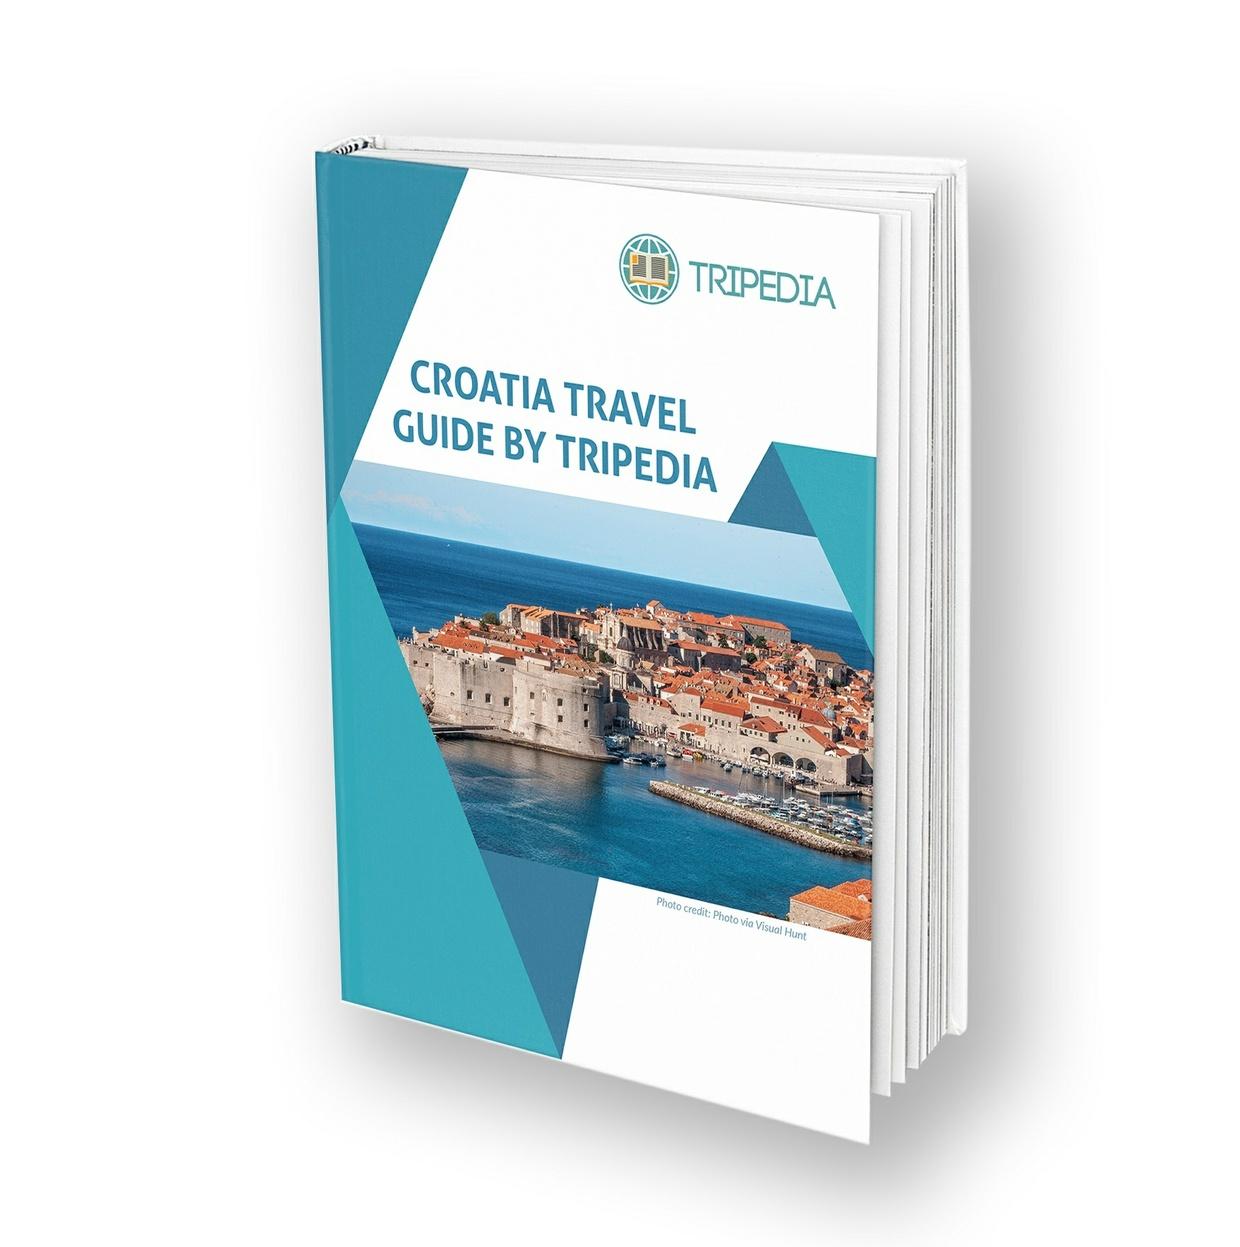 Croatia travel guide by Tripedia